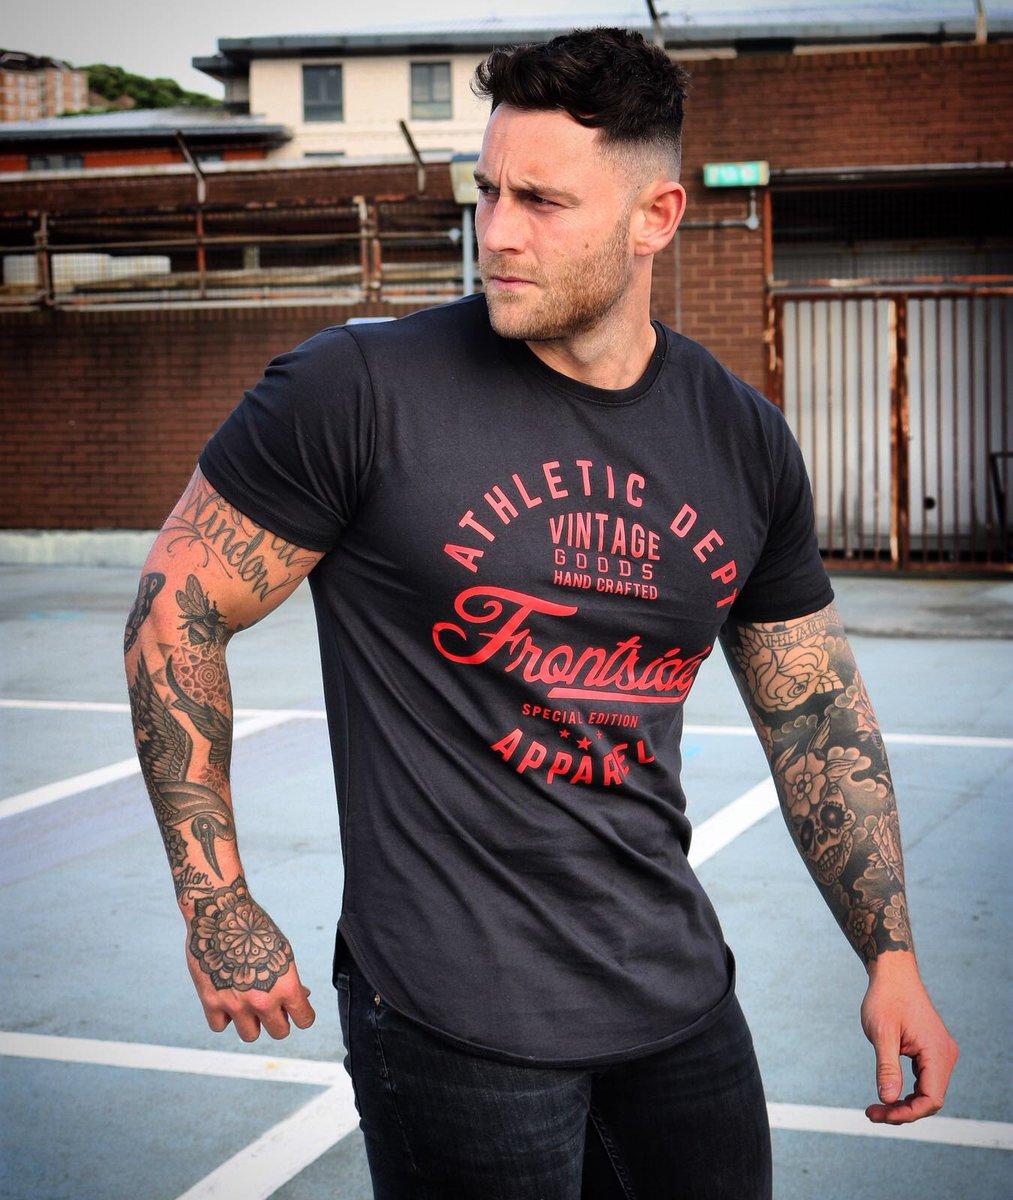 Athletic Department #PositiveVibes #fitness #makeyourownlane #gymlife #motivation #bodybuilding #gym #fitnesswear #Mensfashion #styleblogger #urban #sportswear #gymstyle #tatted #inspirational #aesthetics #bodypower #vans<br>http://pic.twitter.com/OI7vukDdZK